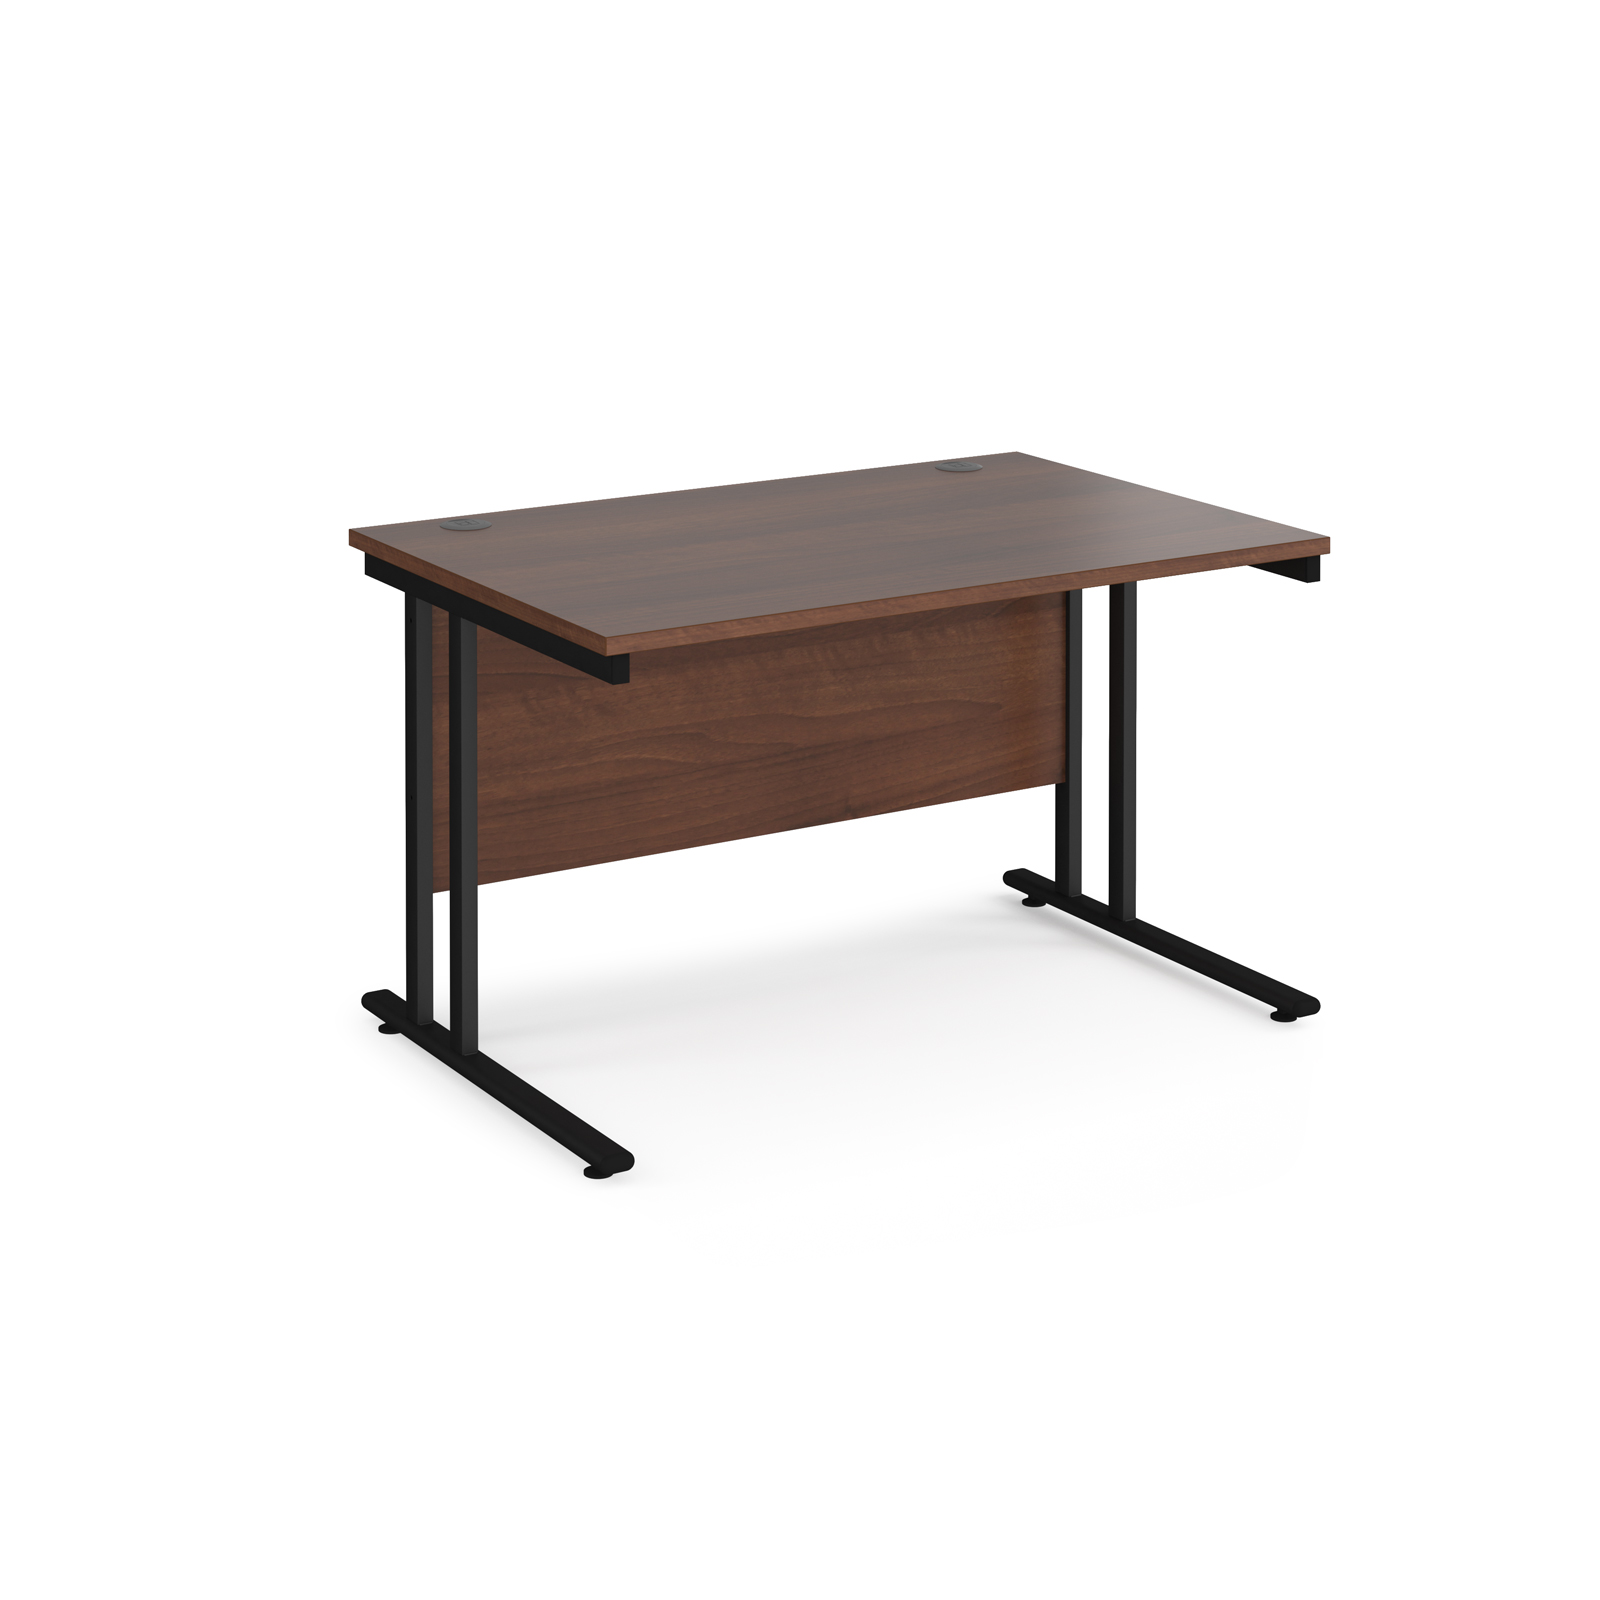 Rectangular Desks Maestro 25 straight desk 1200mm x 800mm - black cantilever leg frame, walnut top